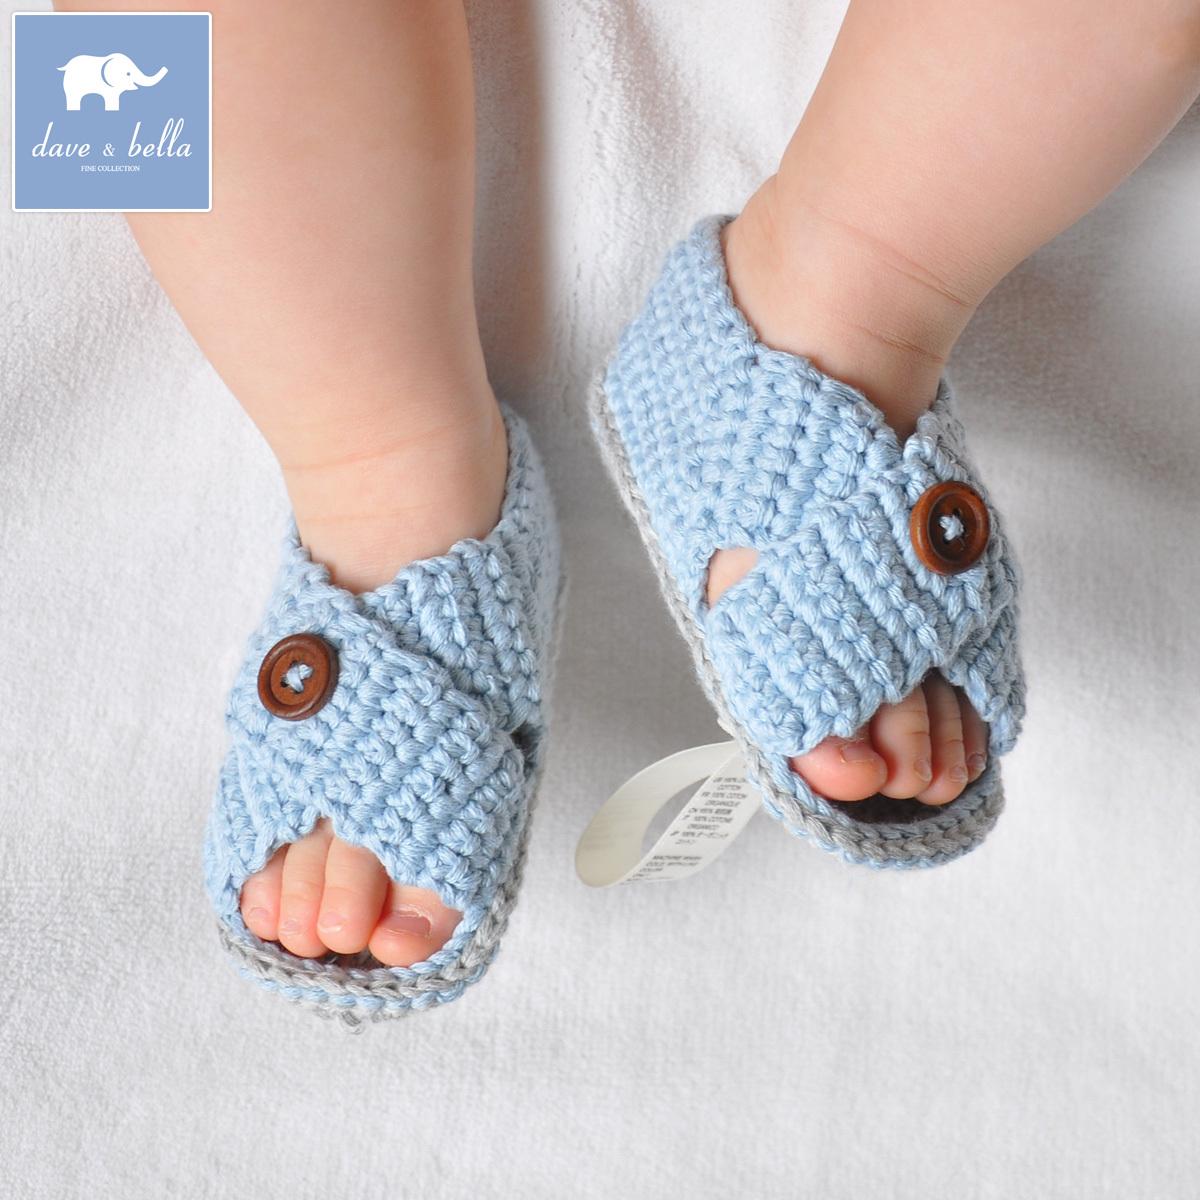 Davebella daiweibeila конце лета мягкой младенца хлопка ручной сандалии Обувь d